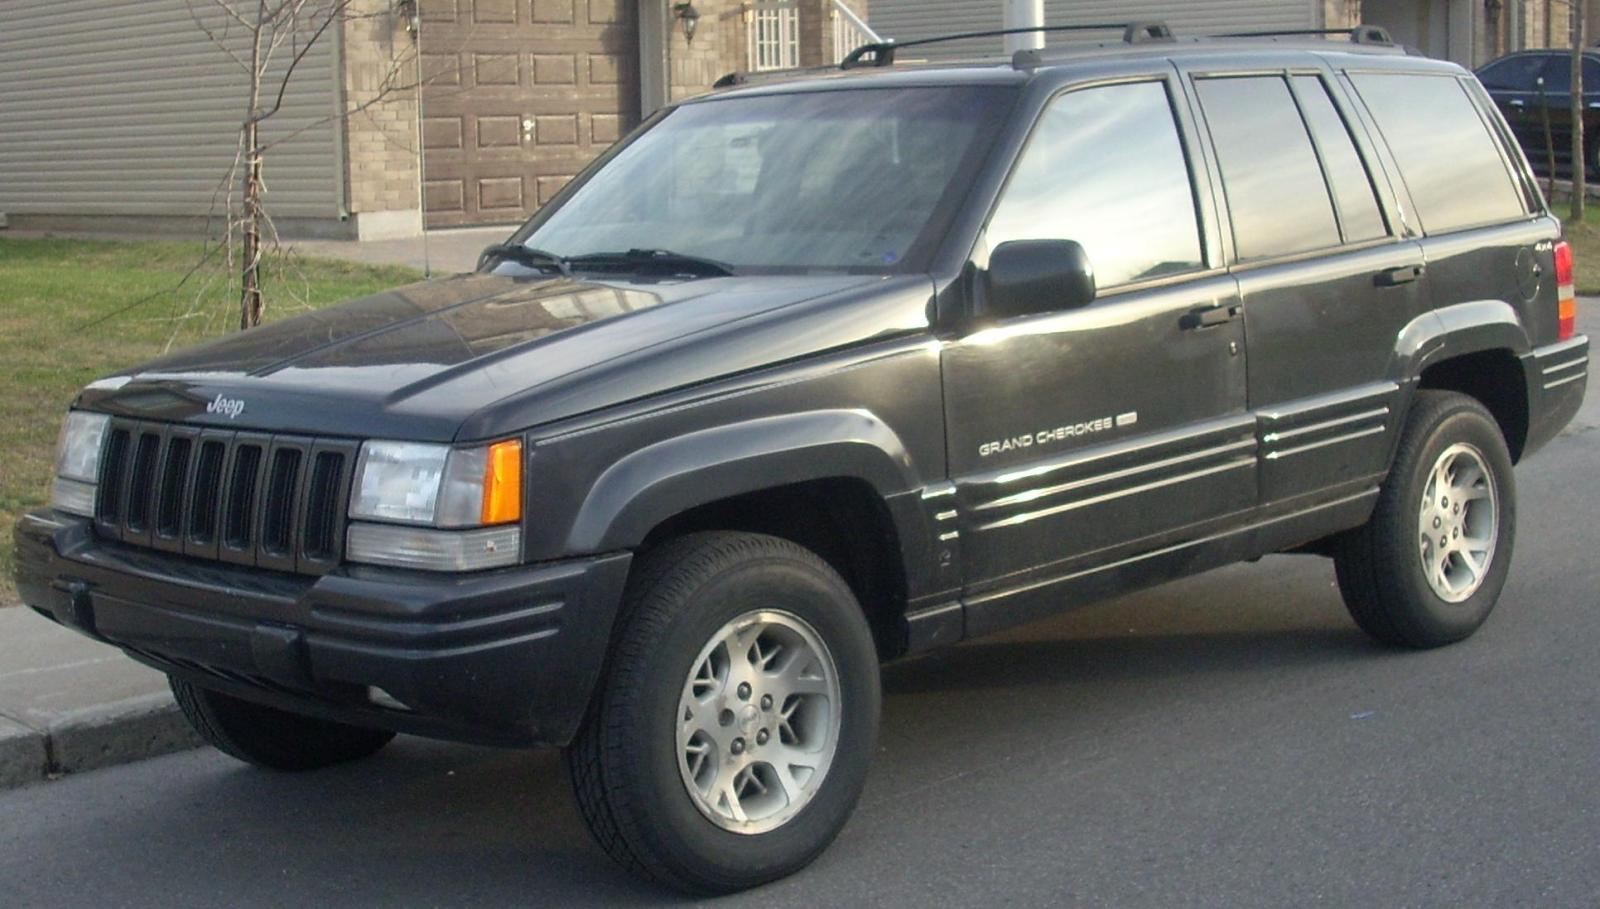 1996 Jeep Grand Cherokee #9 Jeep Grand Cherokee #9 800 1024 1280 1600  Origin ...